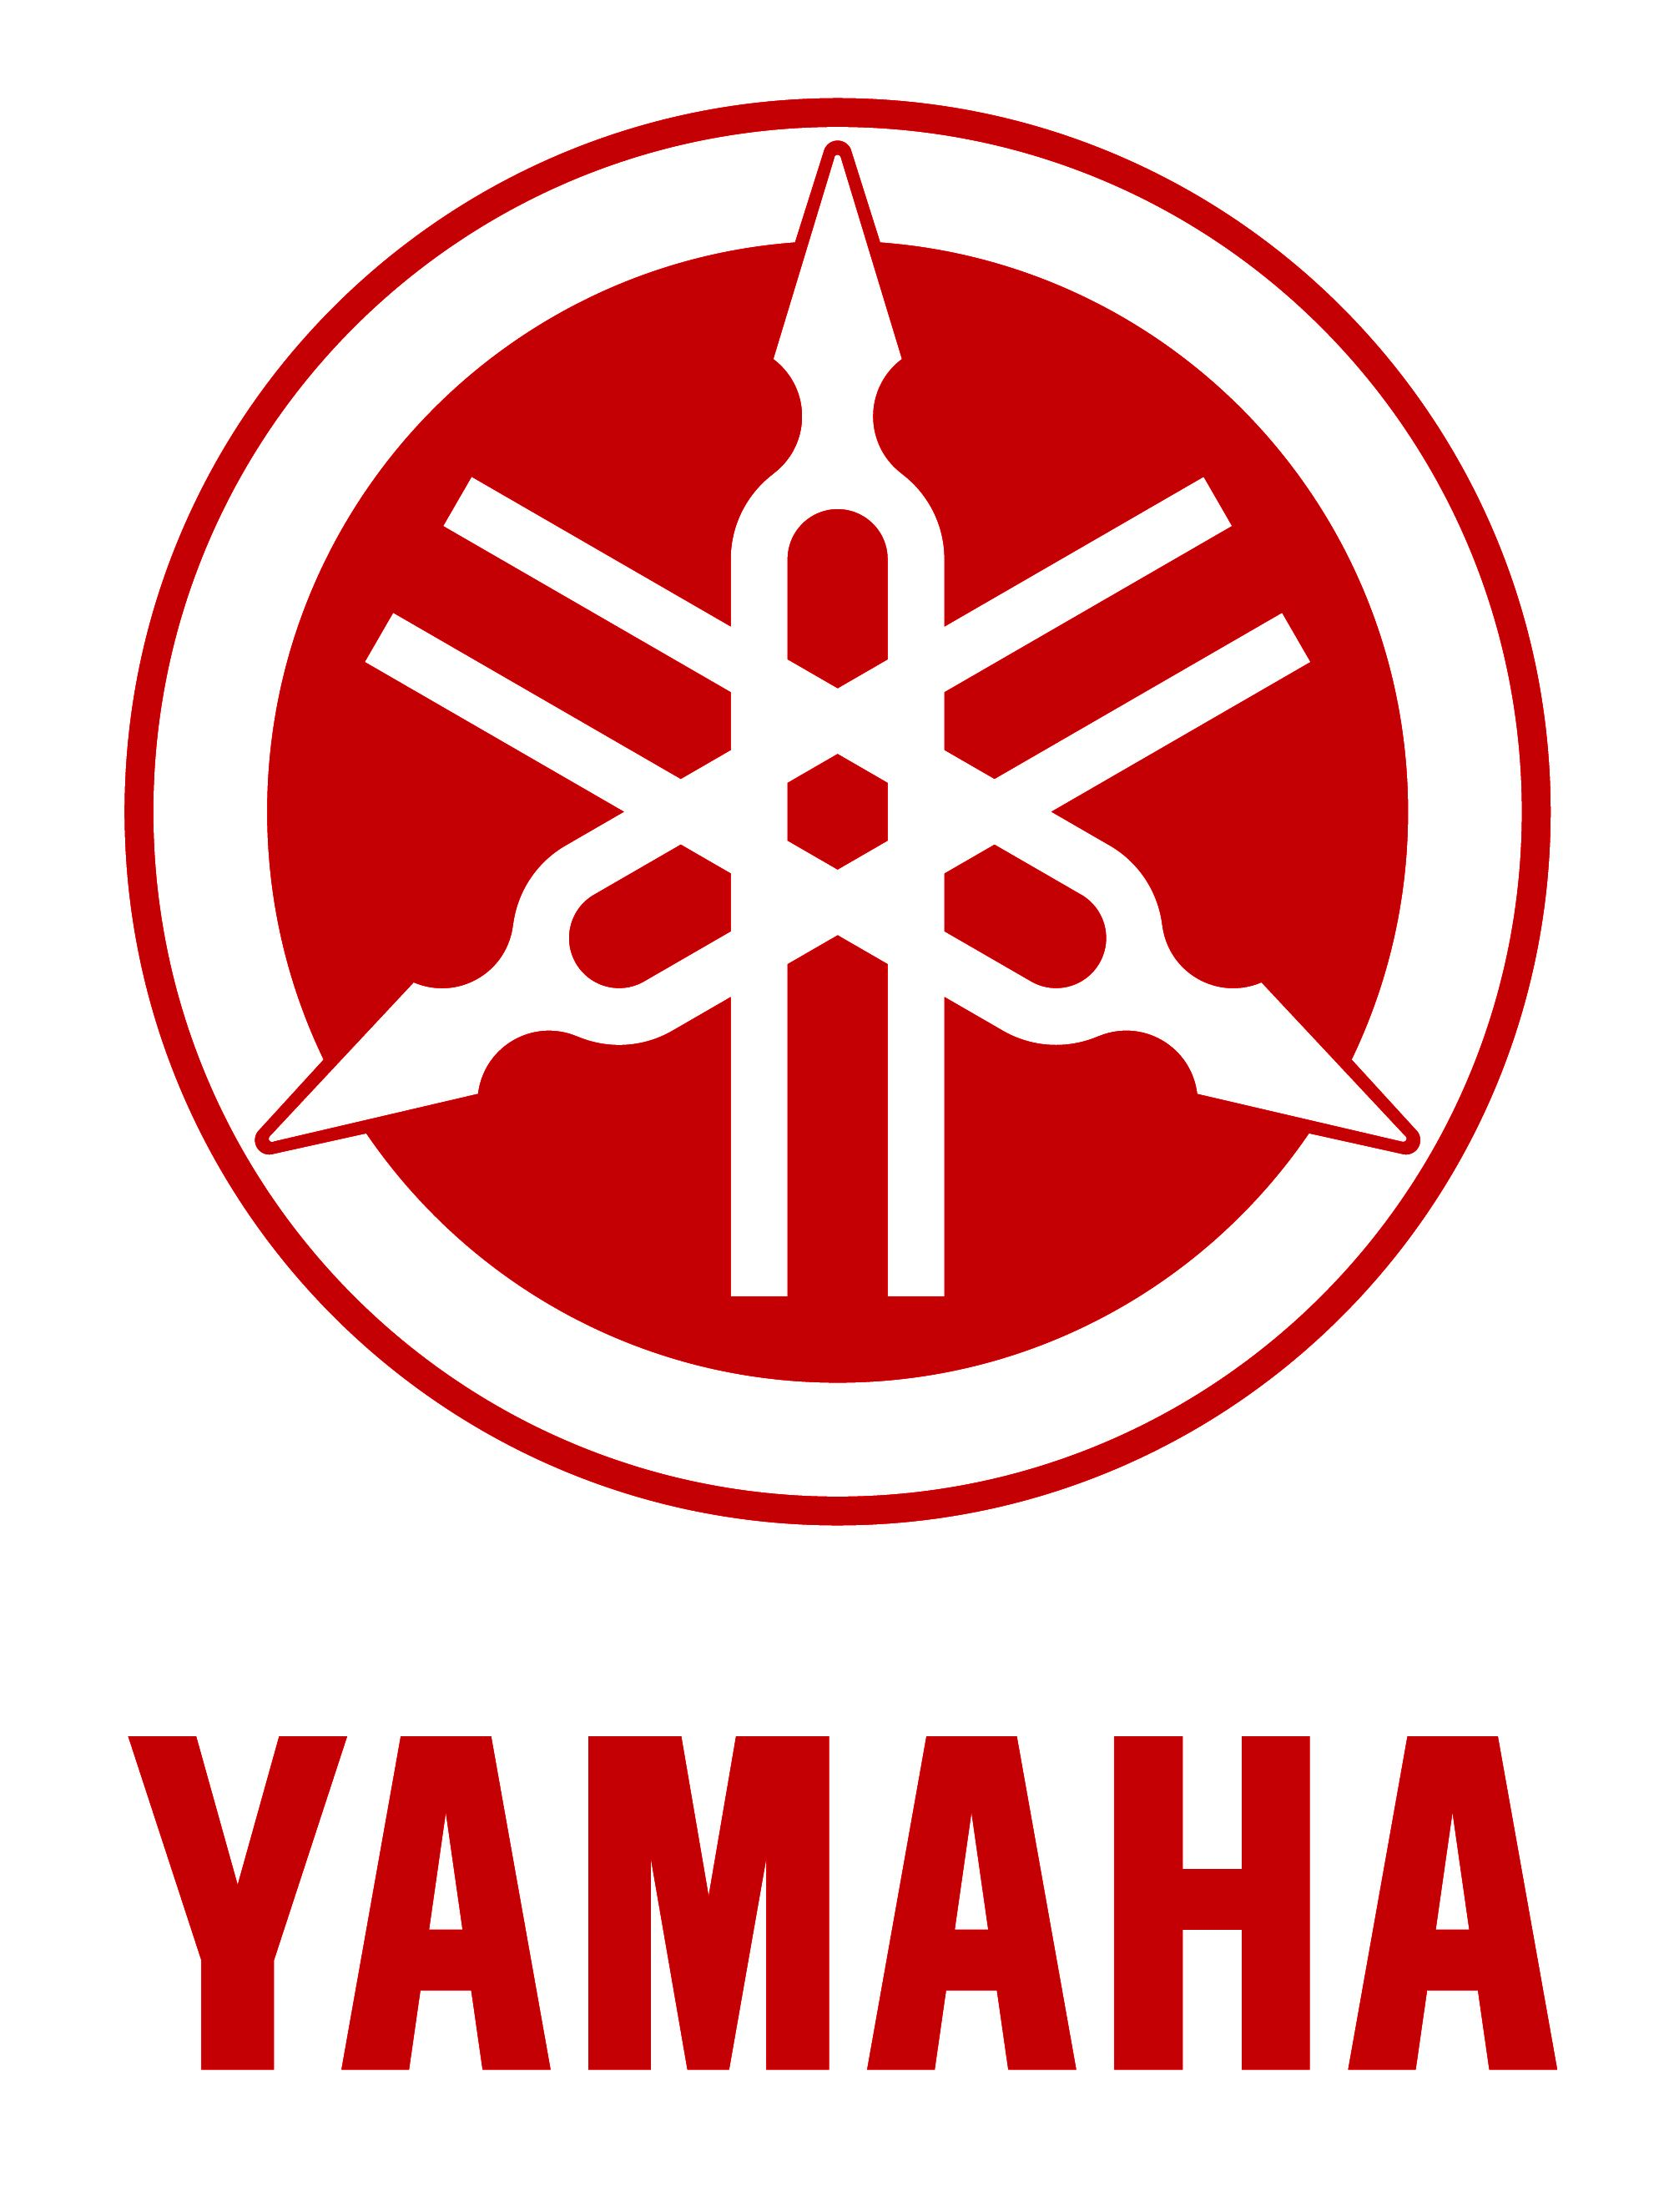 Yamaha motor logo transparent image army jerry can for Yamaha headquarters usa